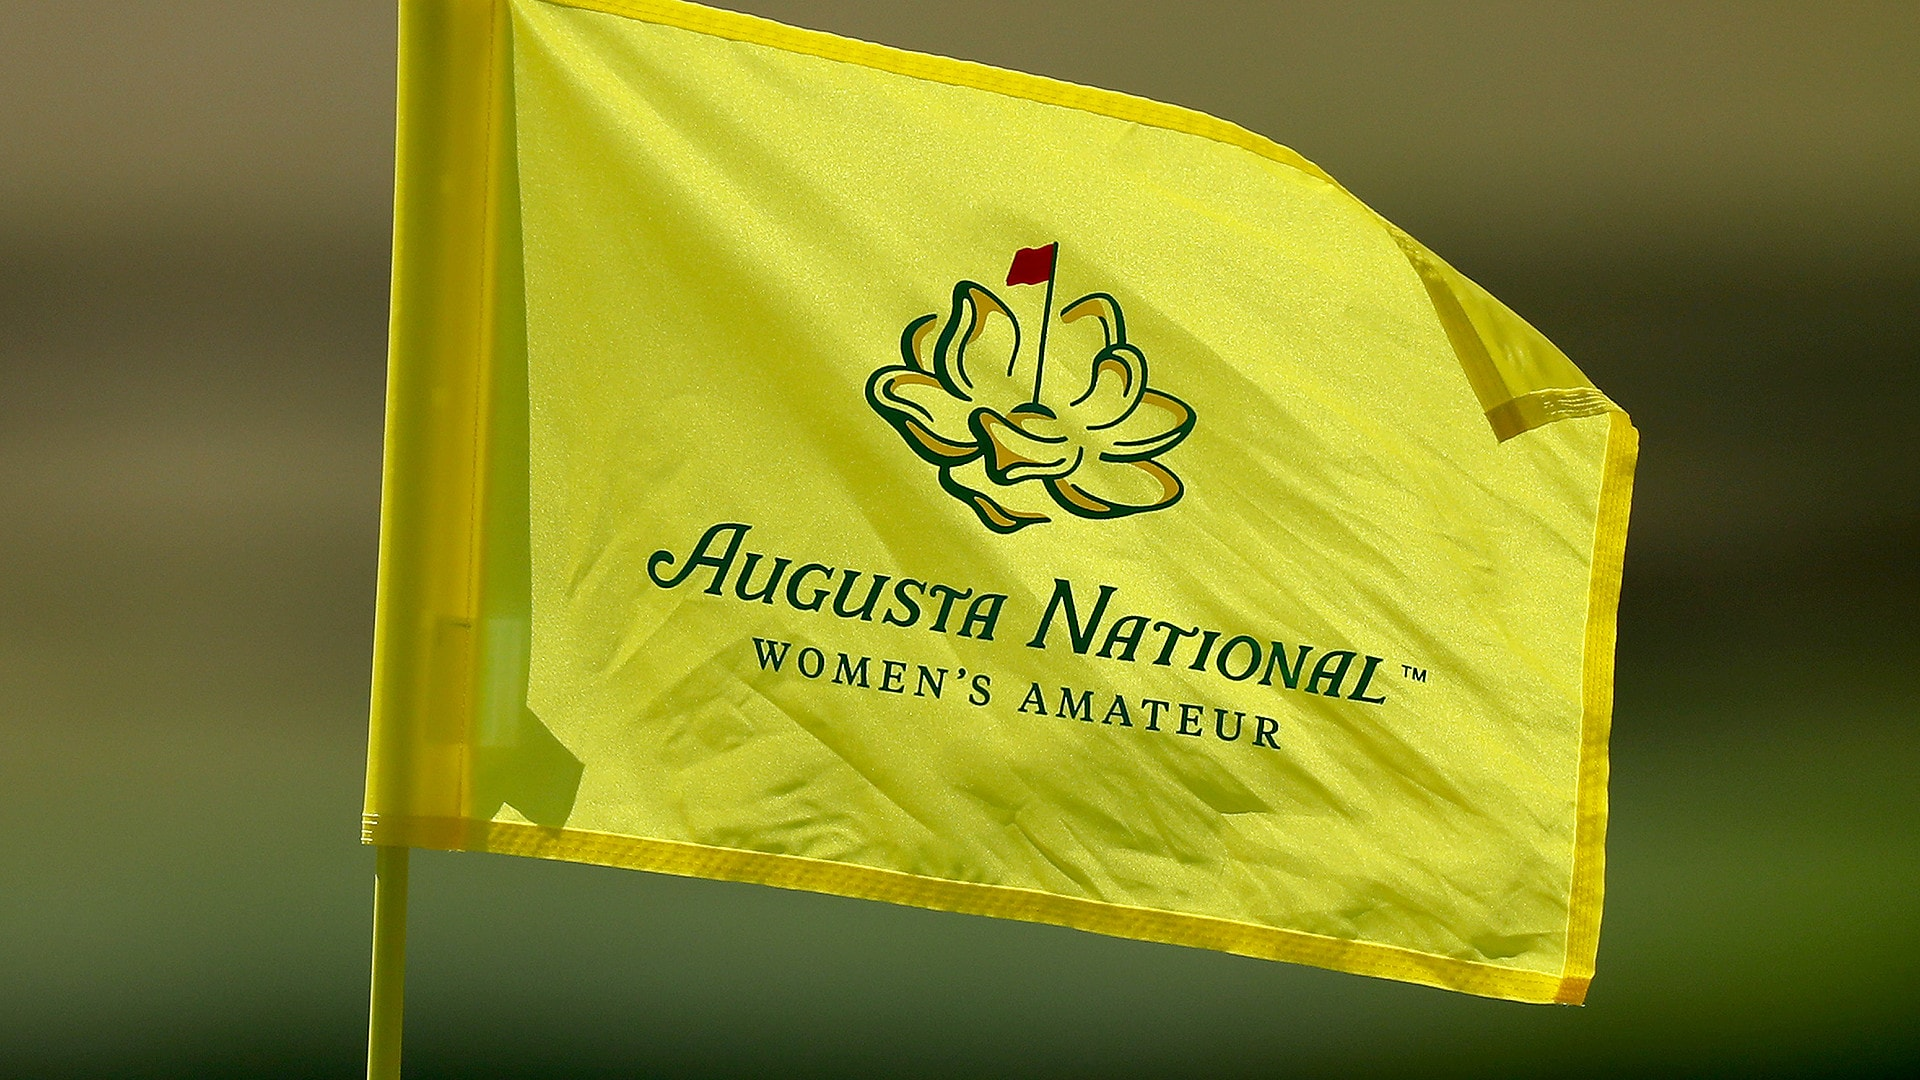 Augusta National Women's Amateur pin flag